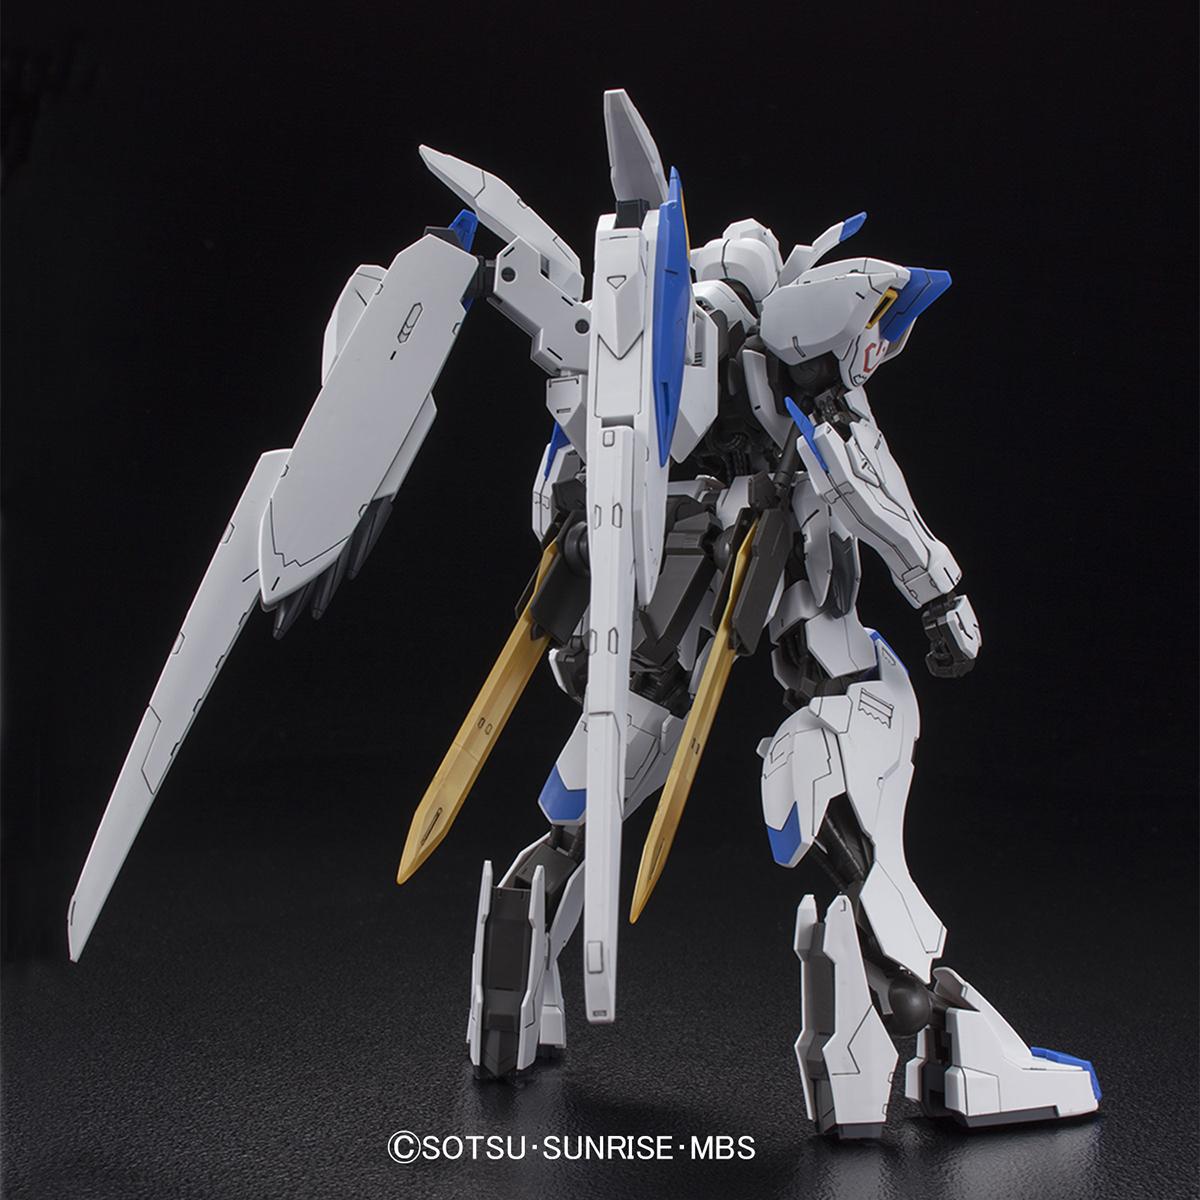 1/100 Full Mechanics Gundam Bael - Release Info